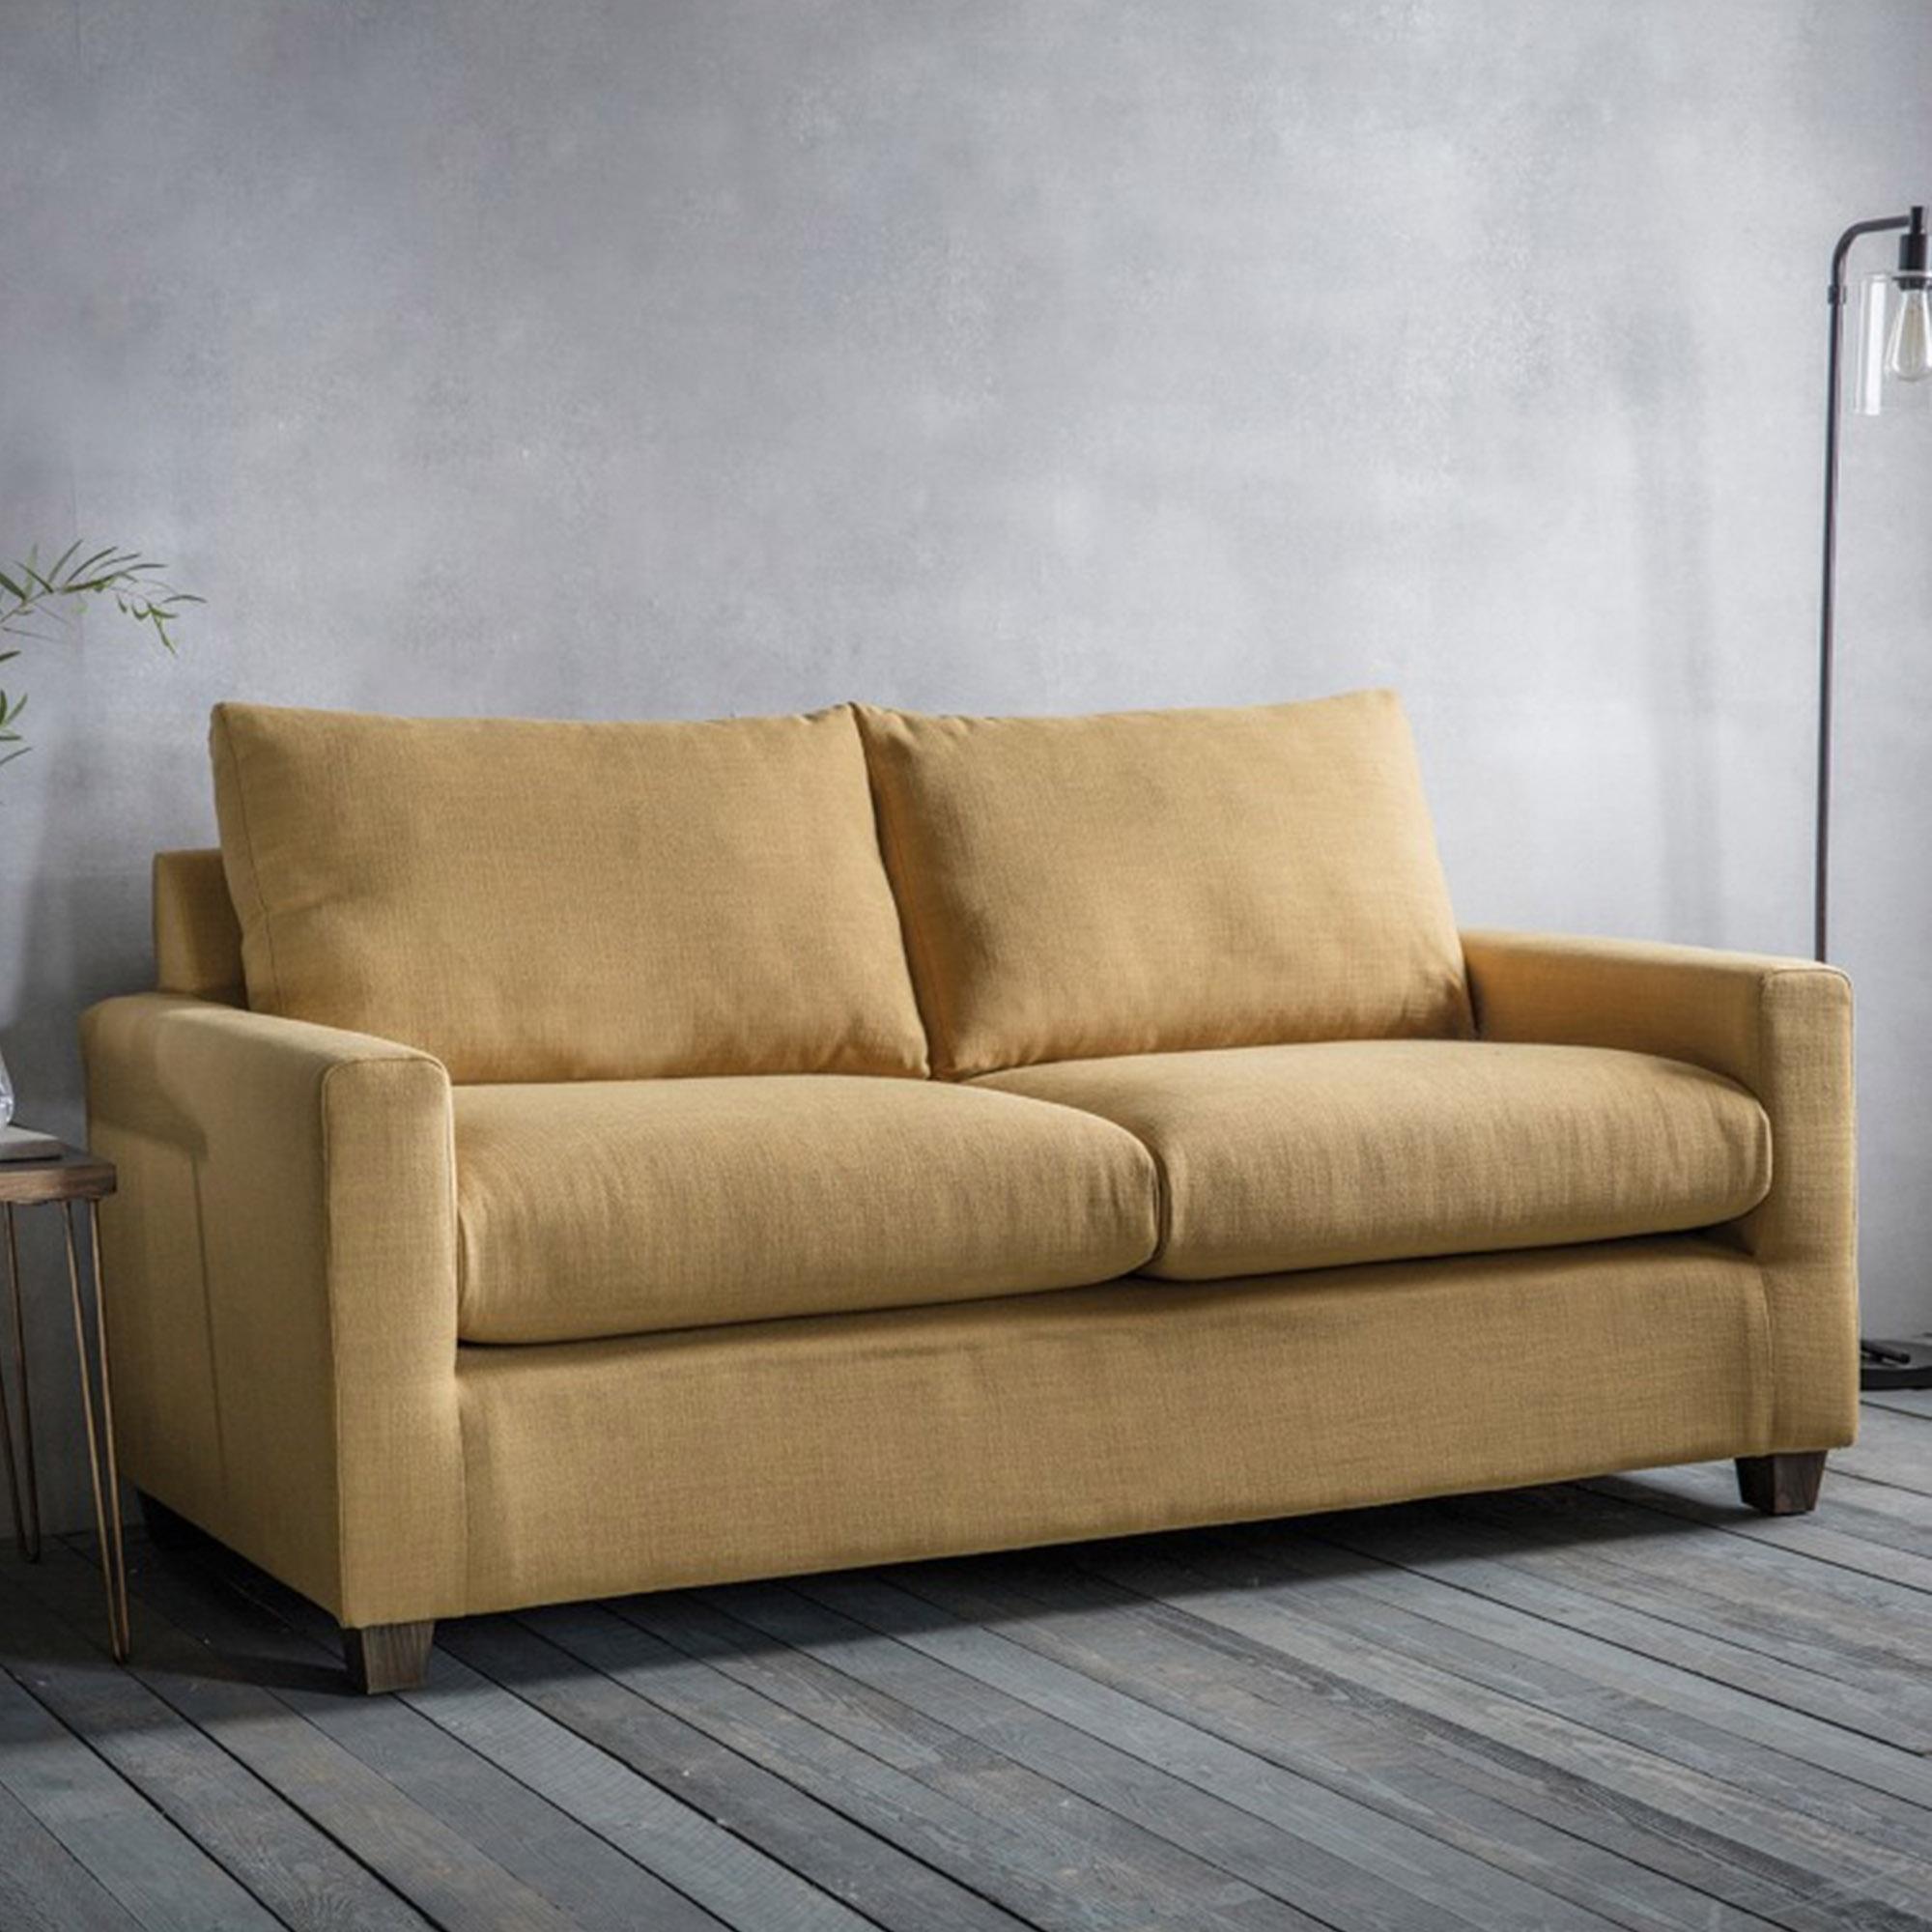 Field Ochre Stratford Sofa Seating Online At Homesdirect365 Regarding Stratford Sofas (Image 6 of 15)